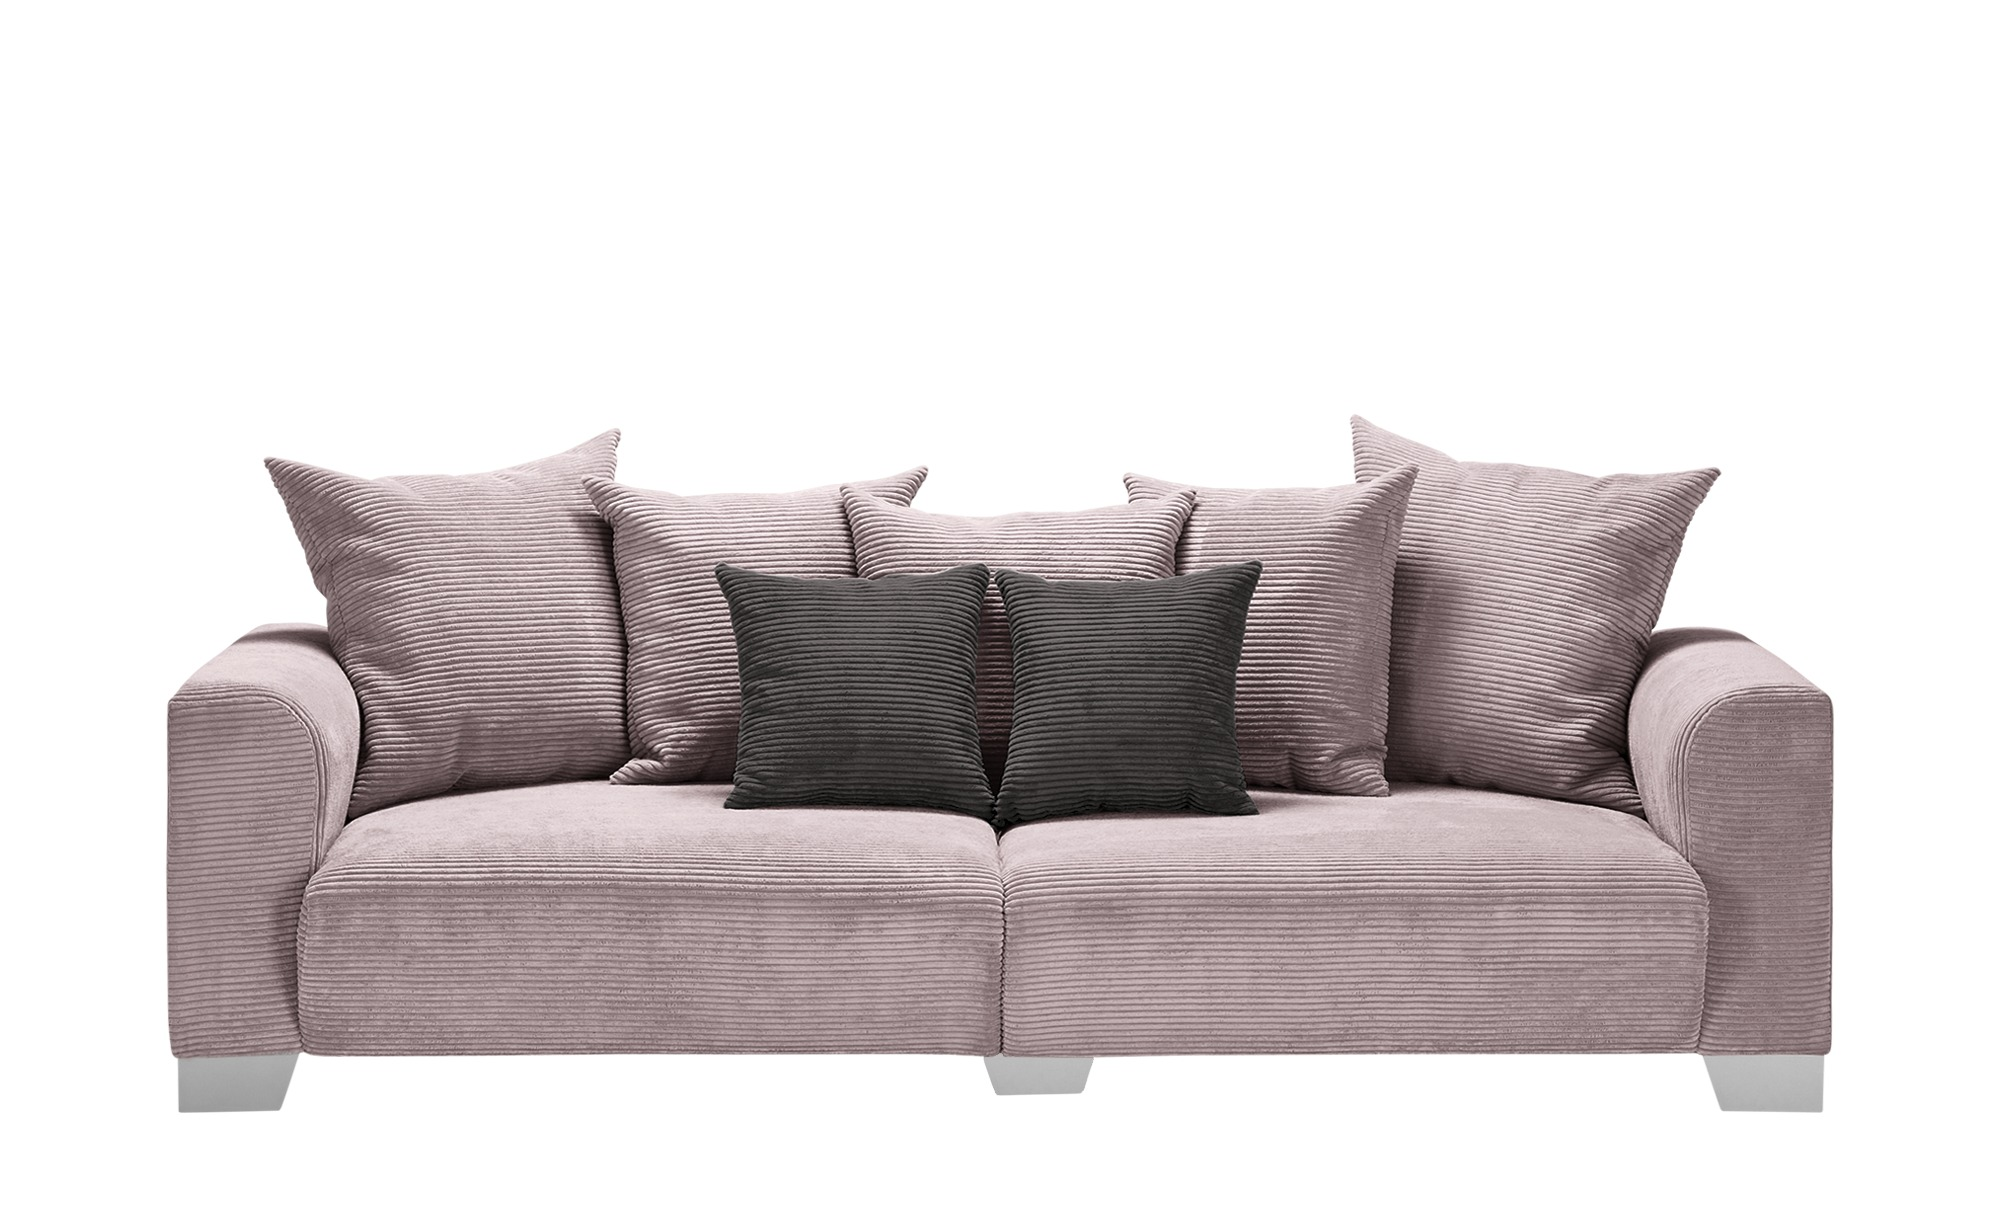 smart Big Sofa  Tonja ¦ rosa/pink ¦ Maße (cm): B: 244 H: 68 T: 107 Polstermöbel > Sofas > Big-Sofas - Höffner